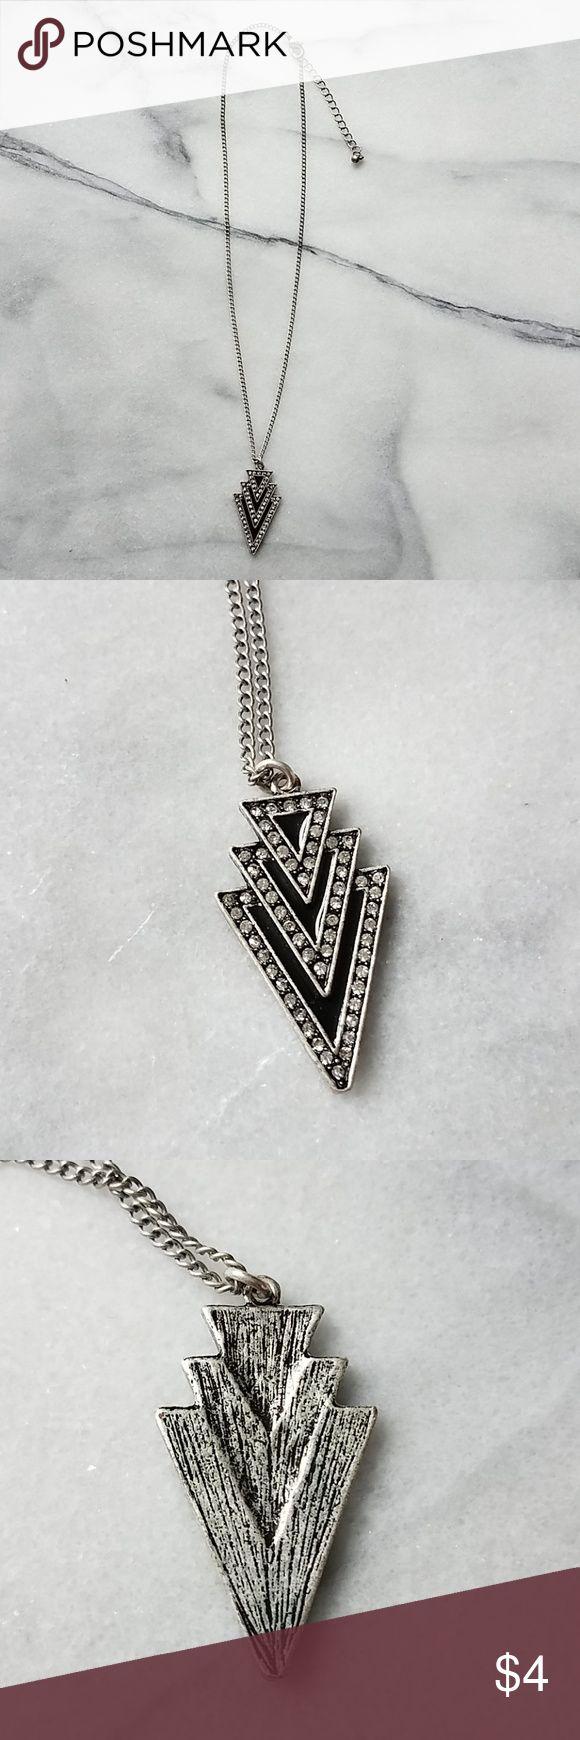 Geometric Black Silver Rhinestone Necklace Silver